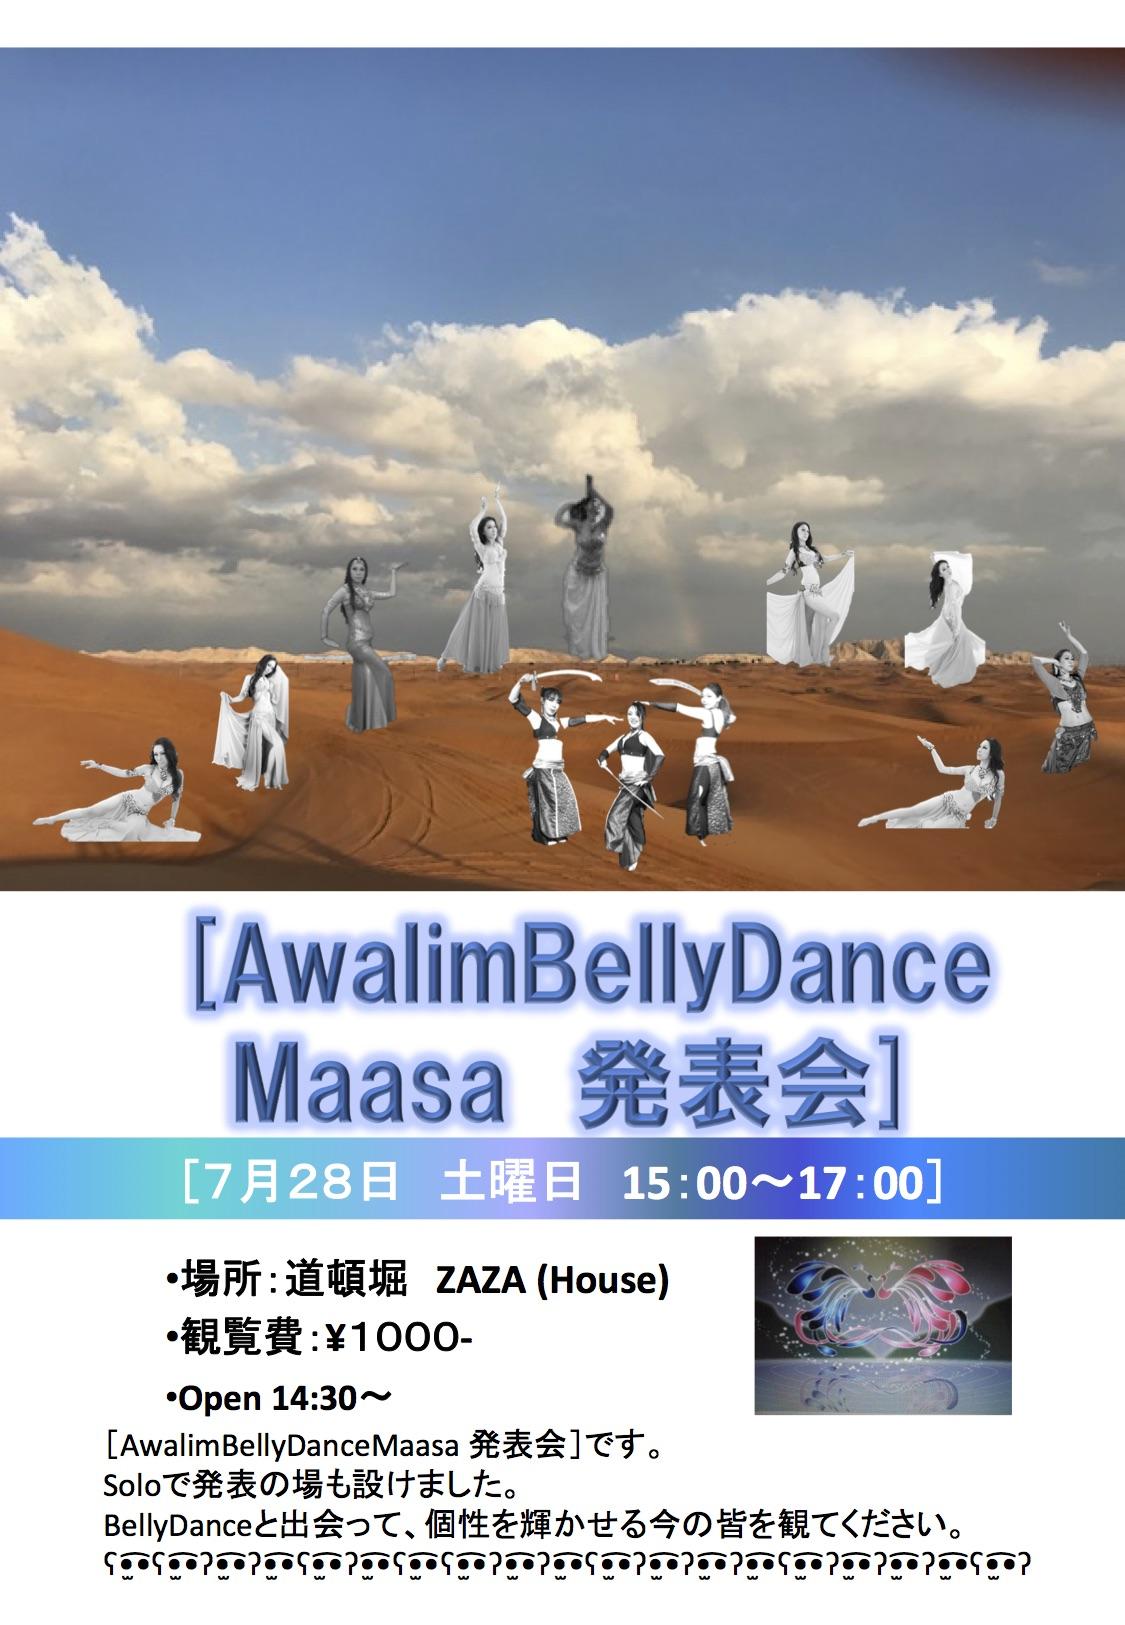 「Awalim Belly Dance Maasa 発表会」の写真